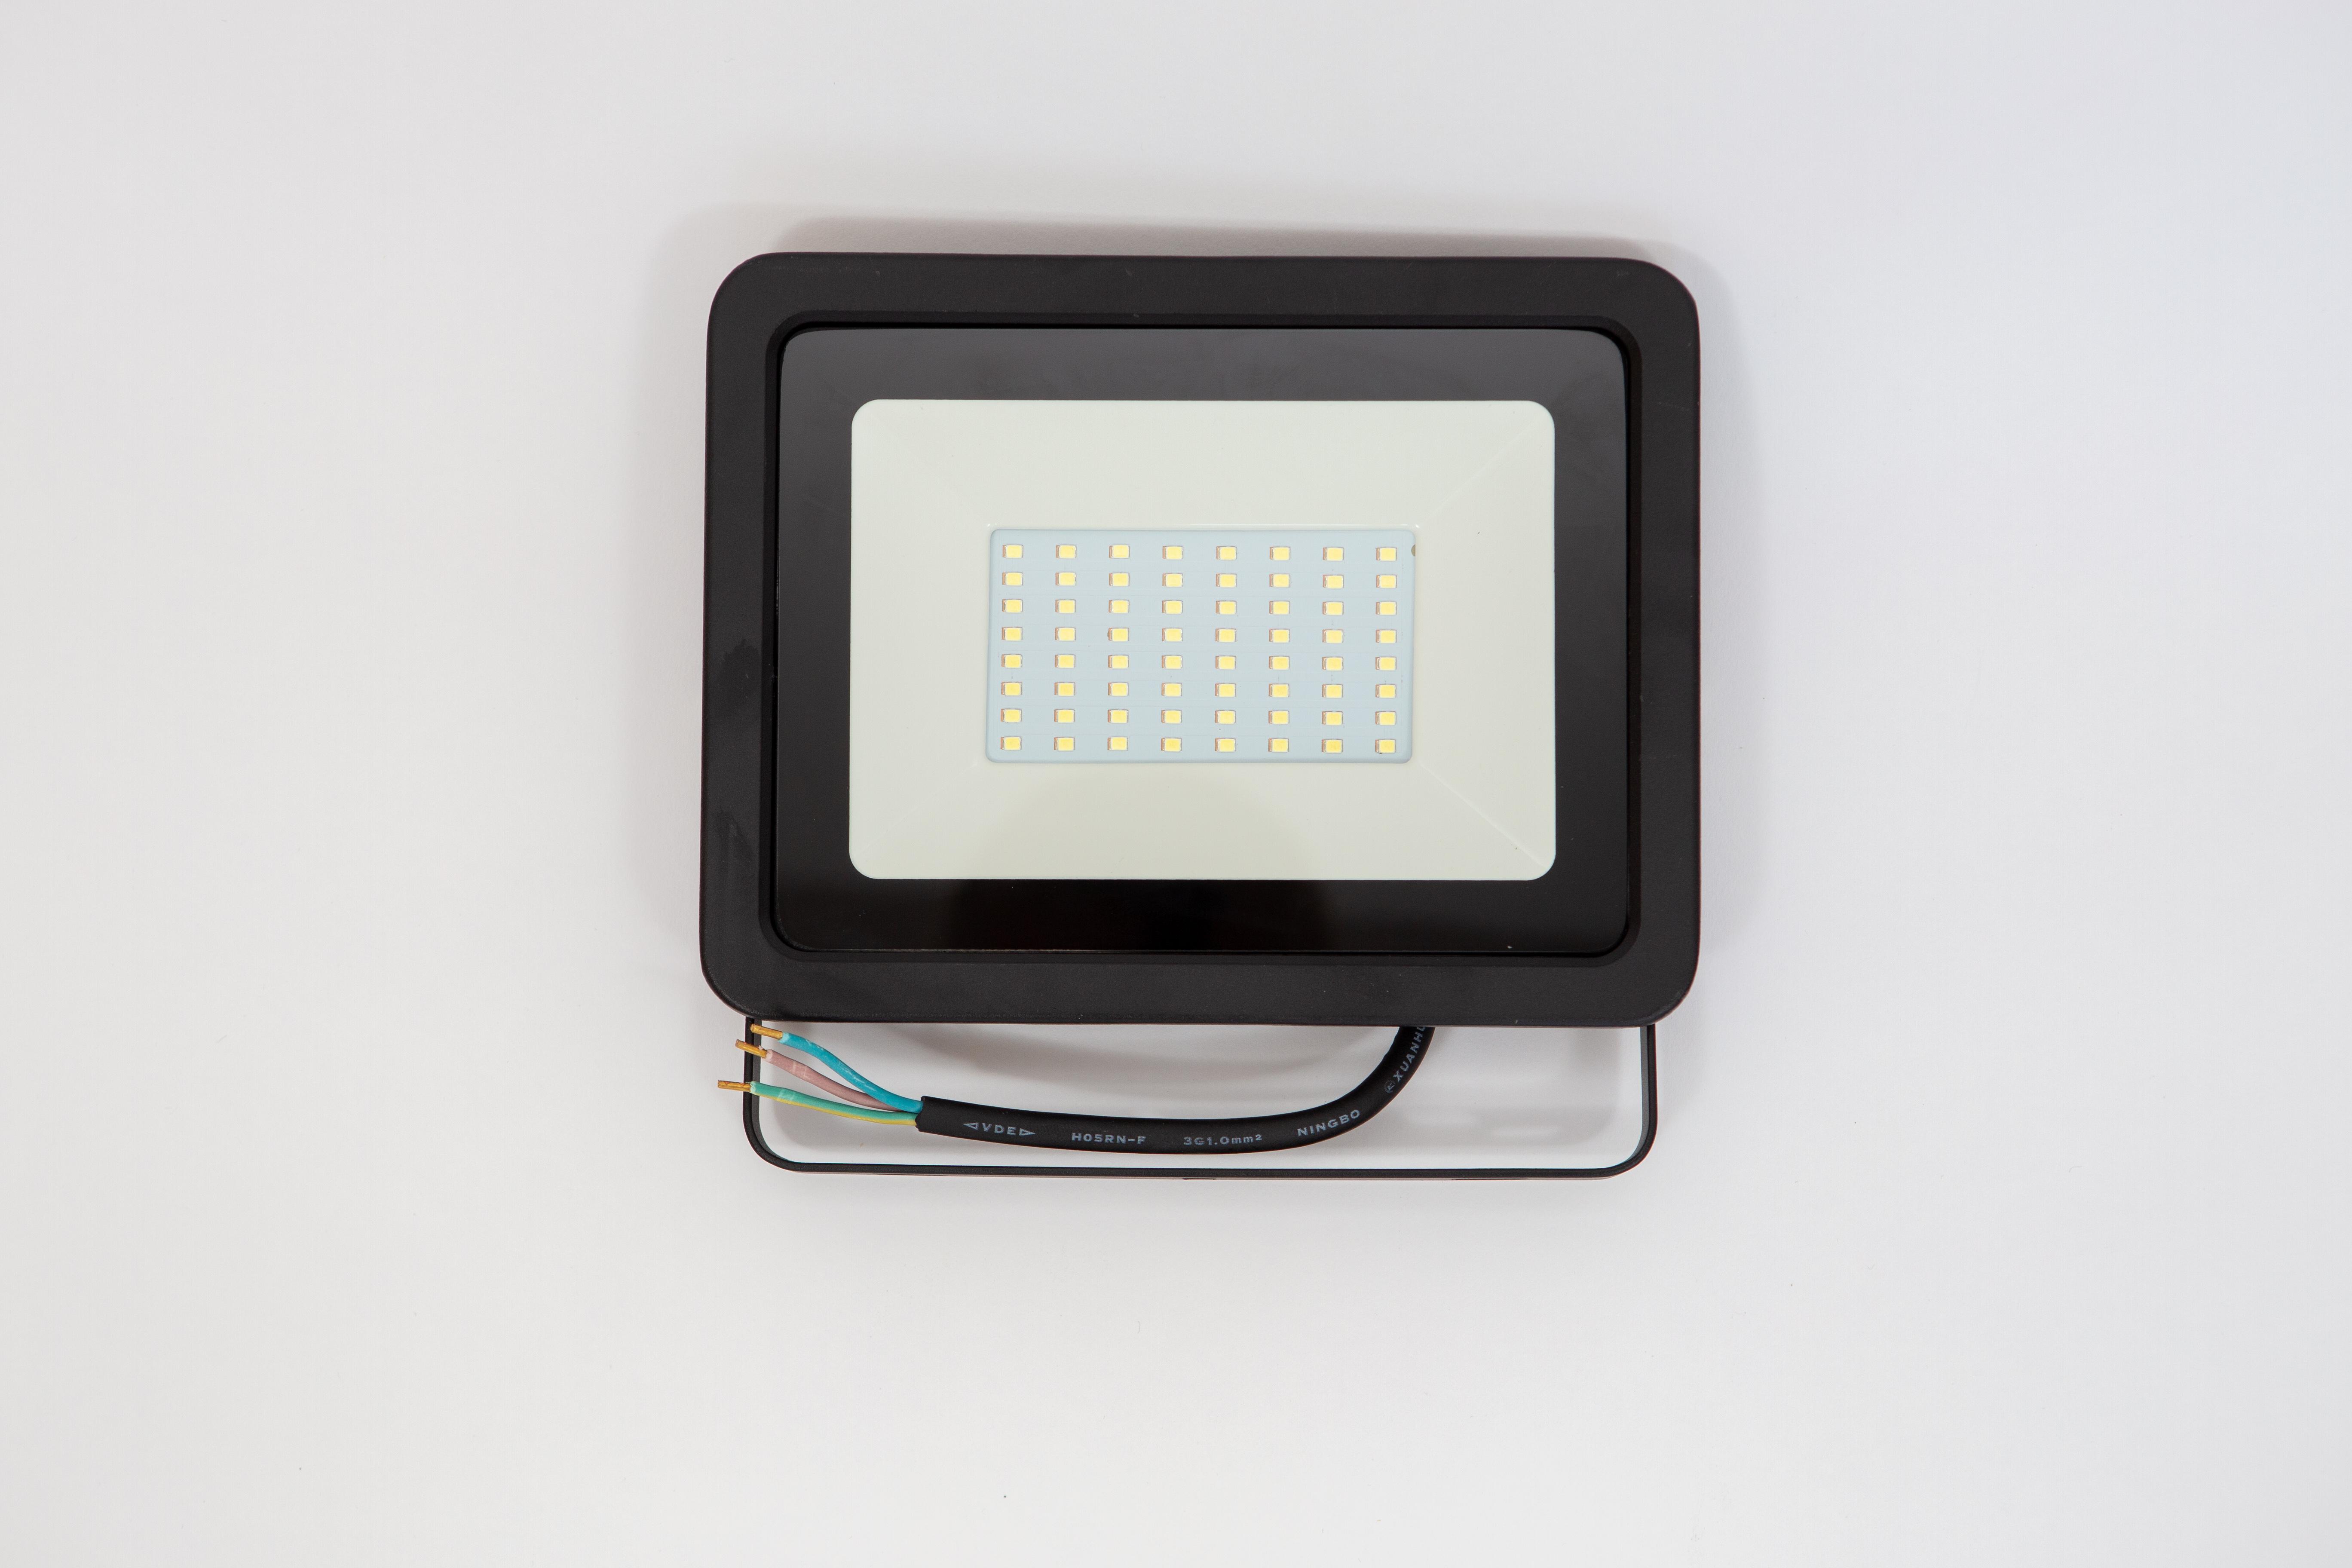 Proiector led 50W, lumina rece (6000 k ), ip 65 , clasa a++,carcasa aluminiu neagra [1]